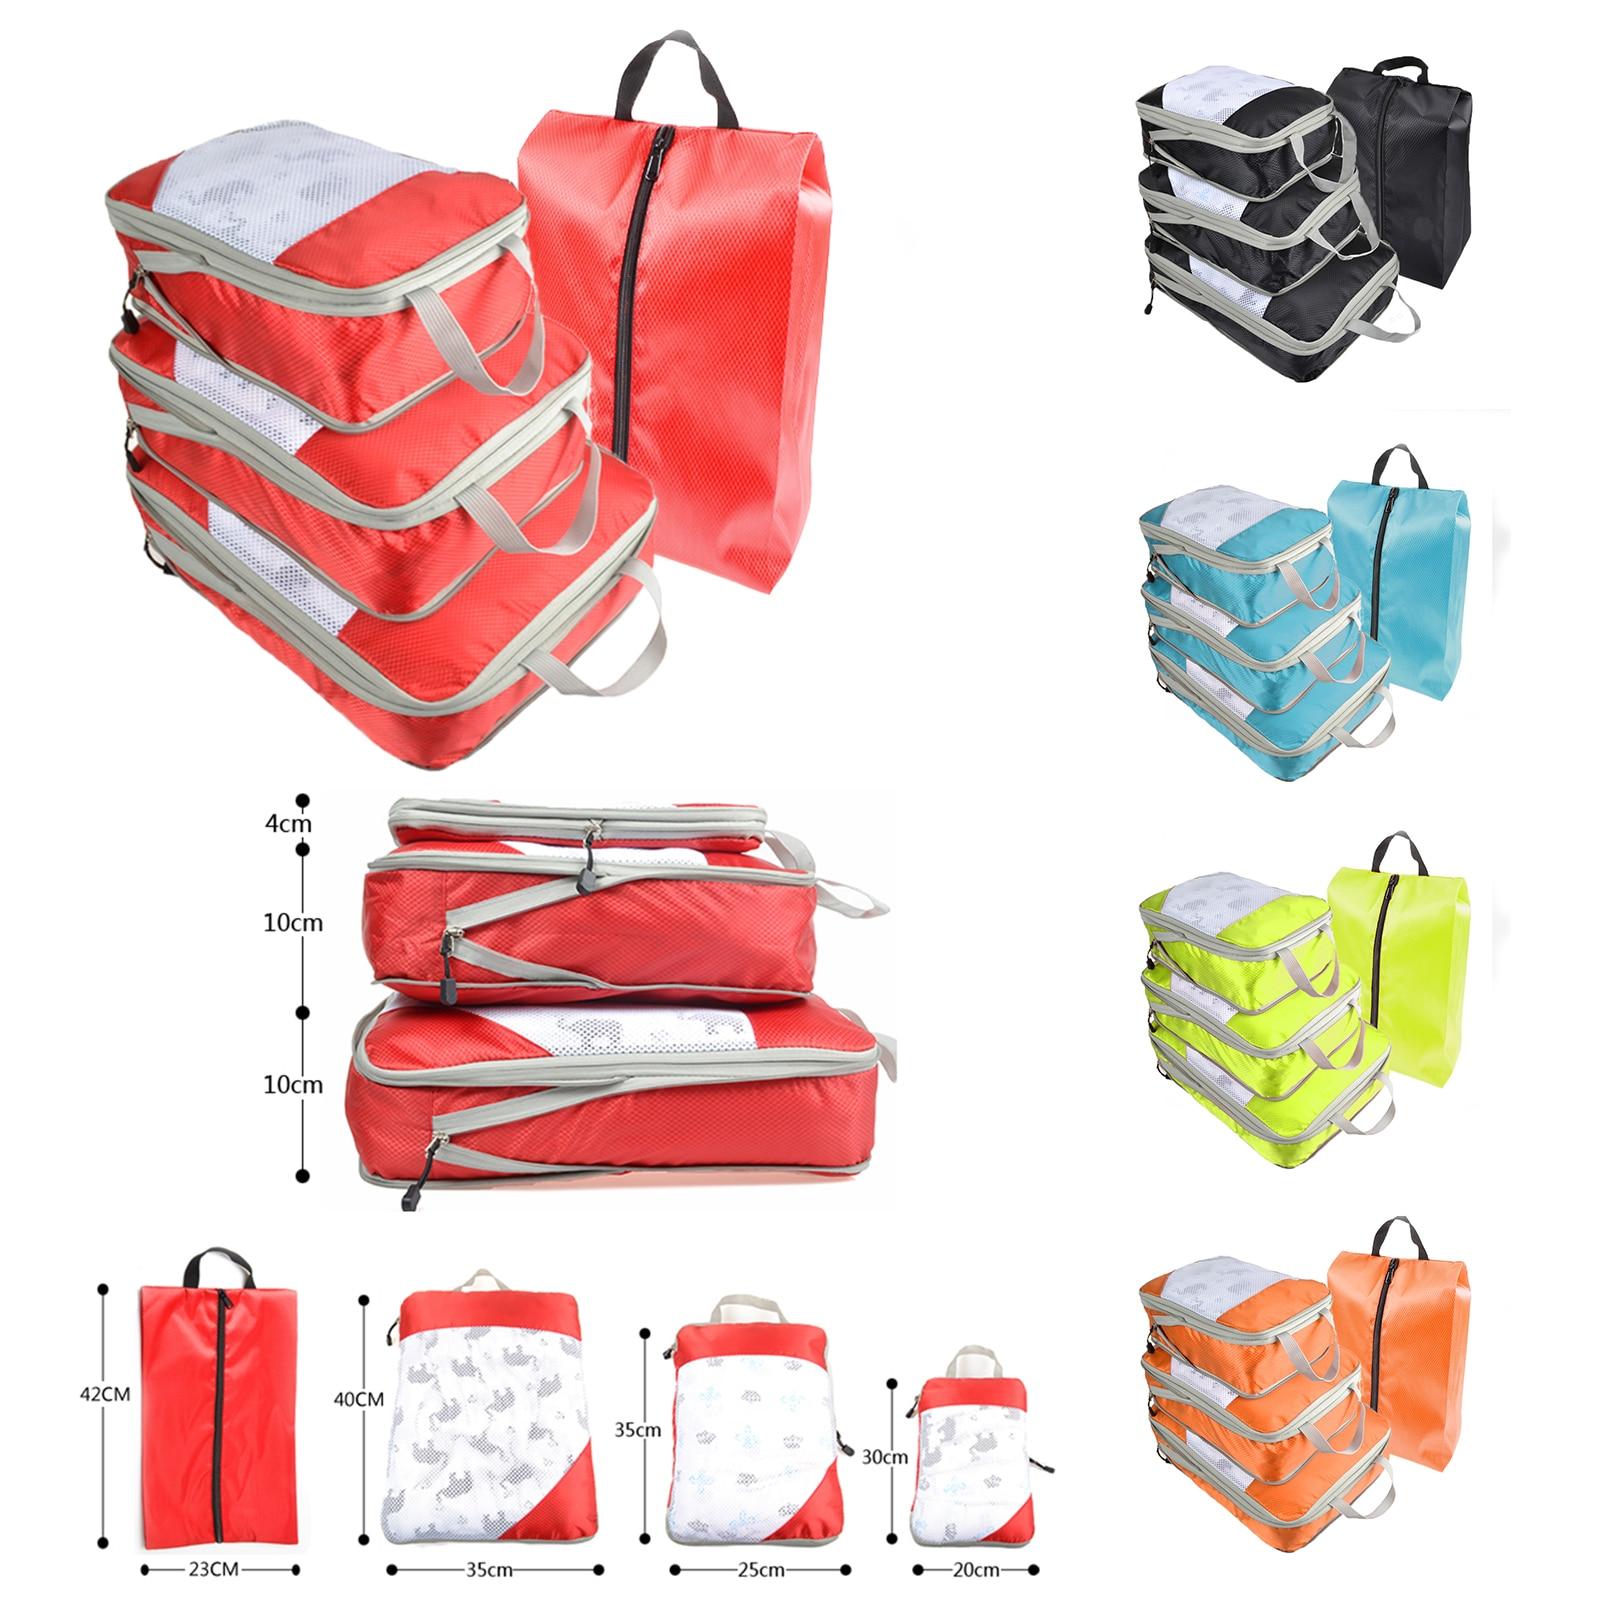 Compression Packing Cubes Travel Luggage Organizer Kids/Foldable/Small/Luxury/Large/Folding Travel Bag Organizer/Men/Women/Set(China)